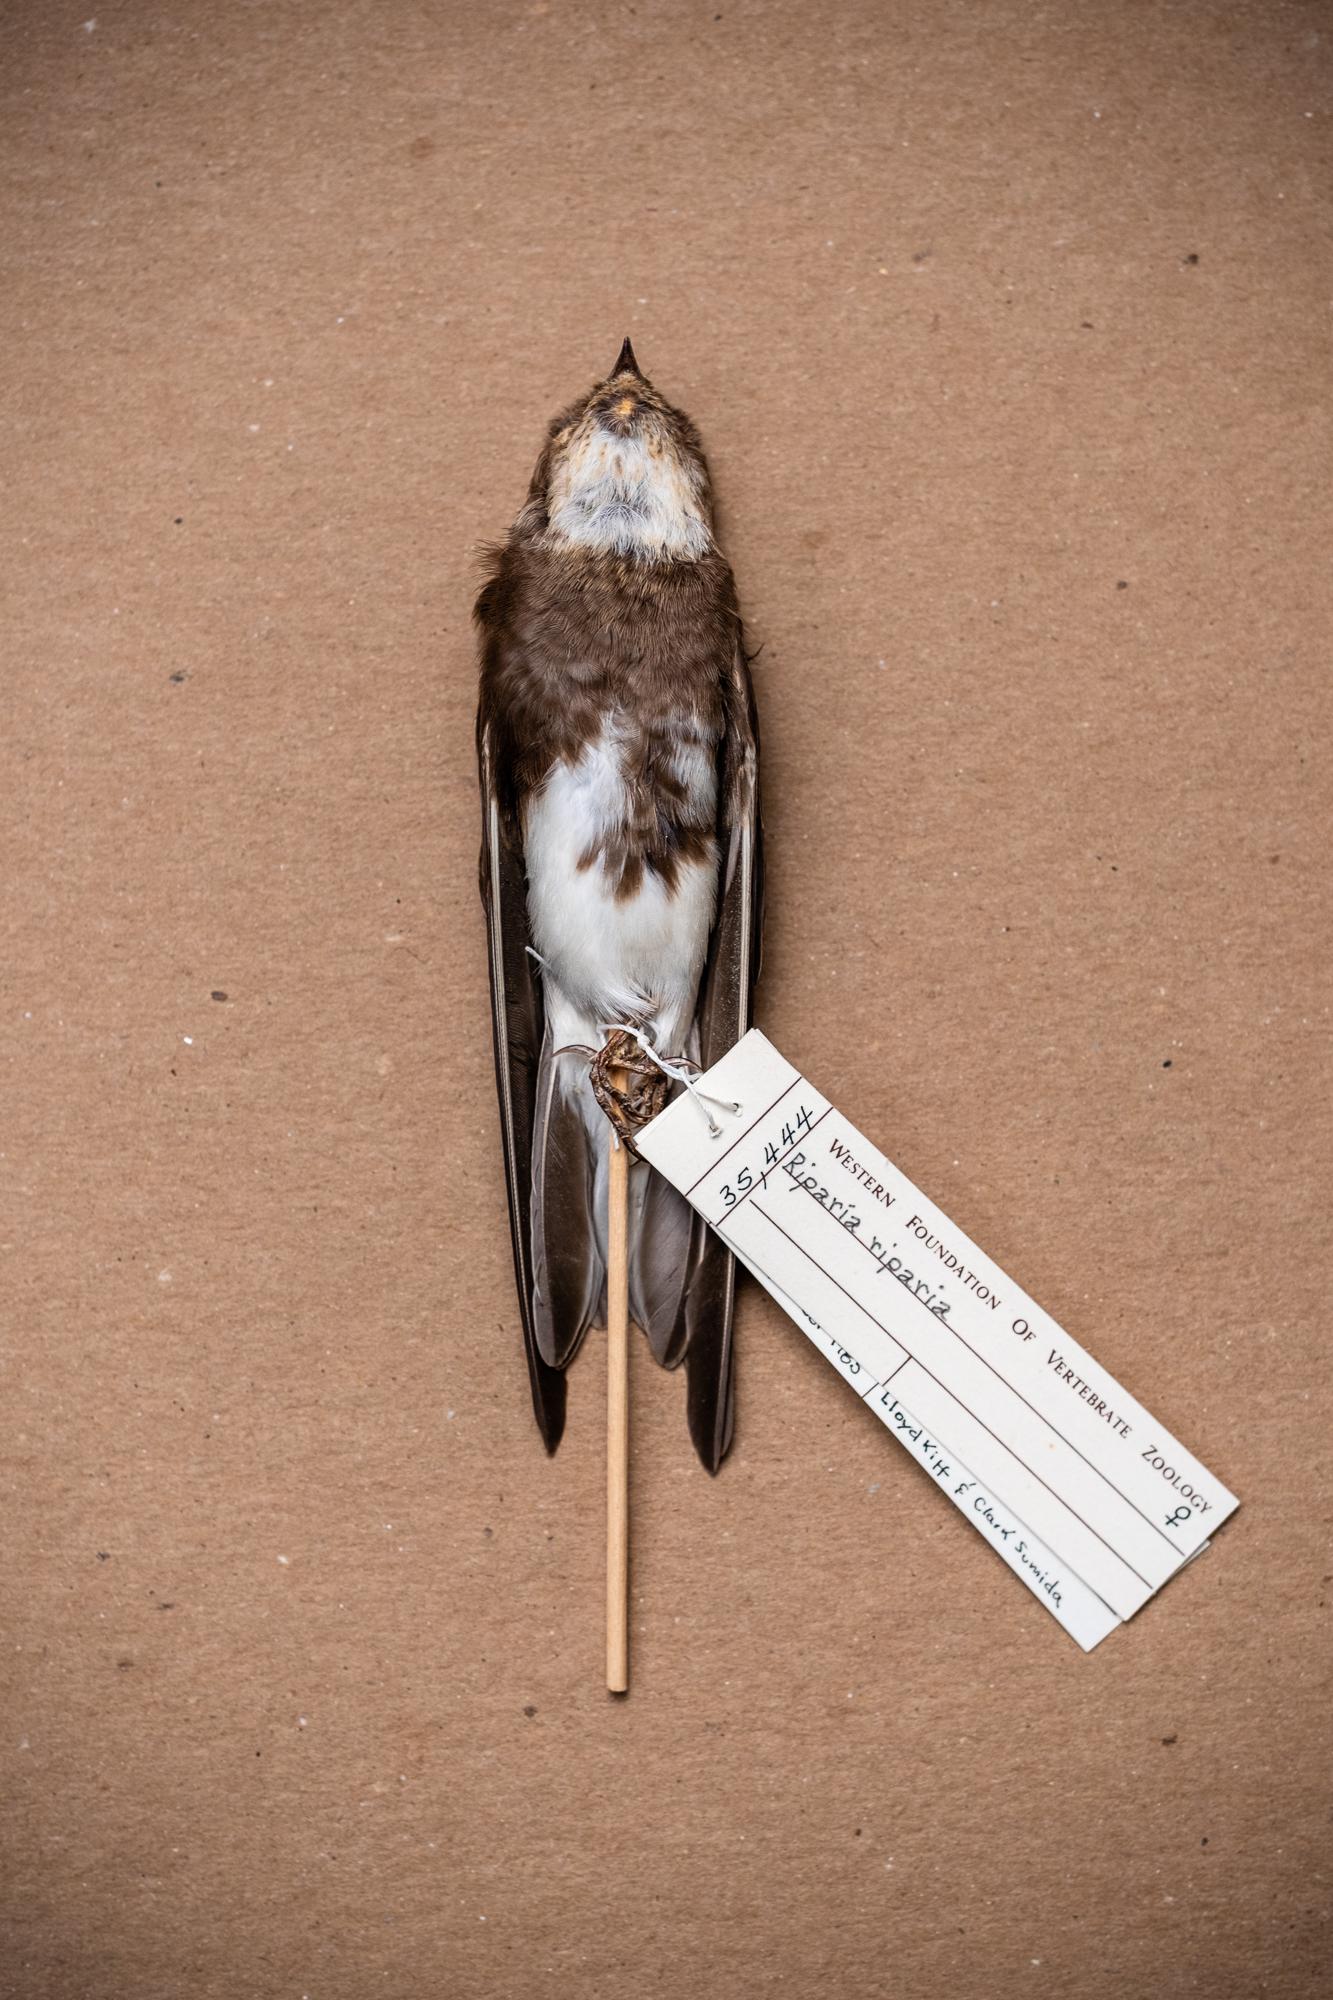 Bank swallow (Riparia riparia)